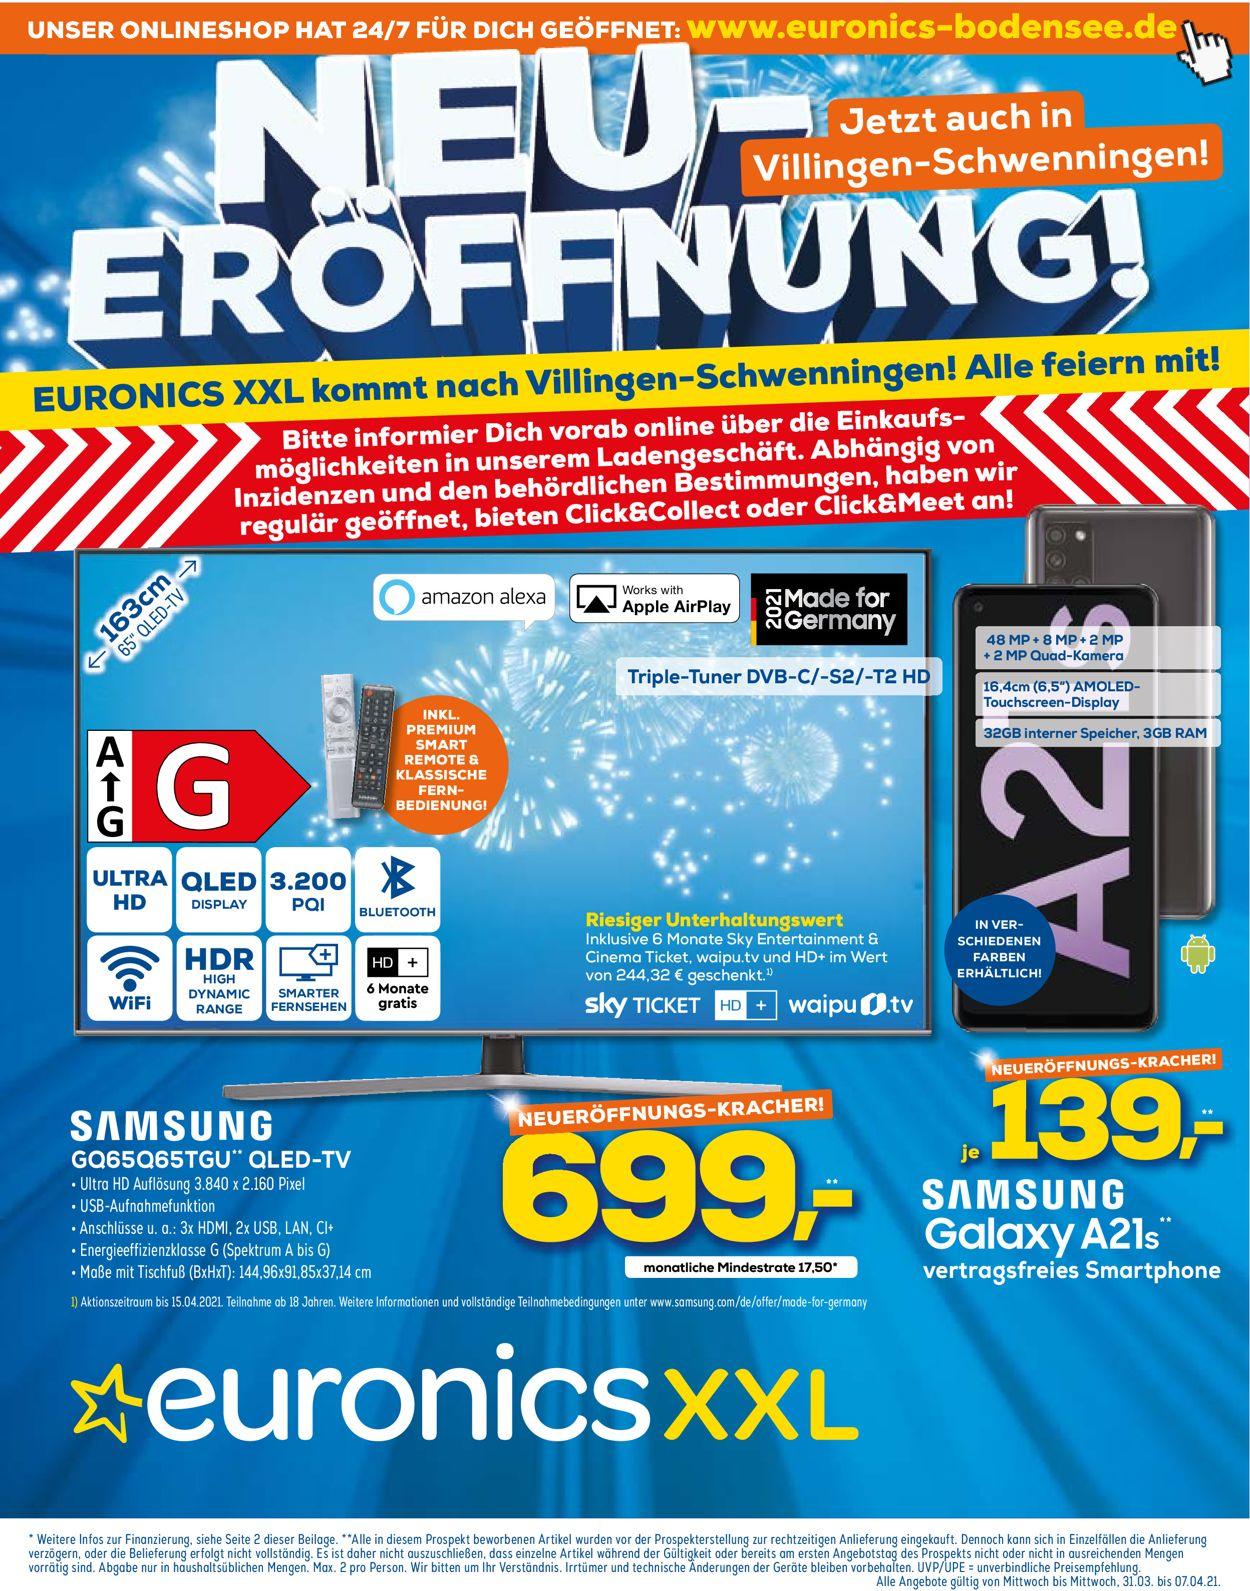 Euronics Prospekt - Aktuell vom 31.03-07.04.2021